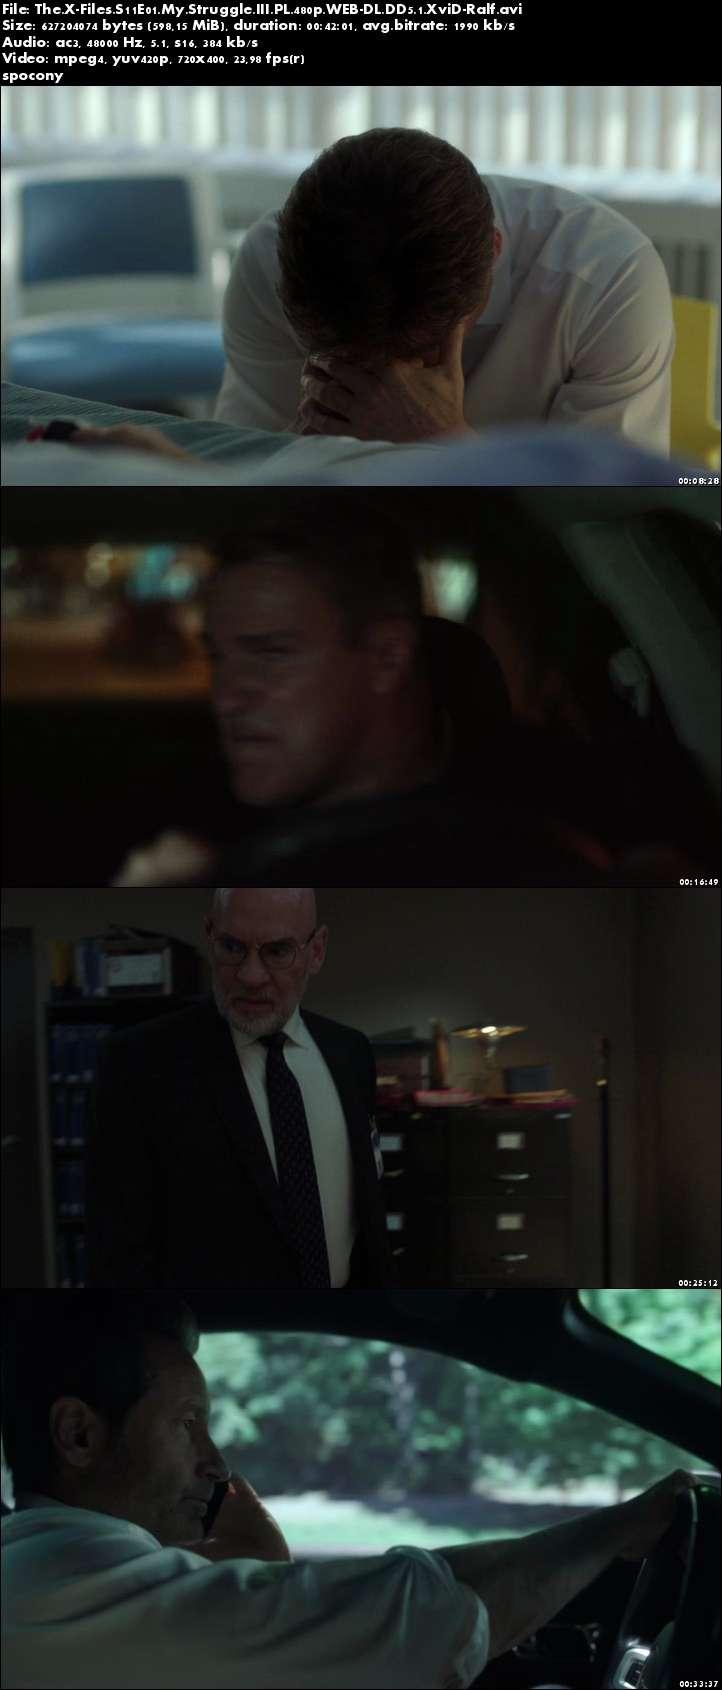 Z archiwum X / The X Files (2018) {sezon 11} (Pełen sezon) PL.480p.WEB.XviD-Ralf [Lektor PL]